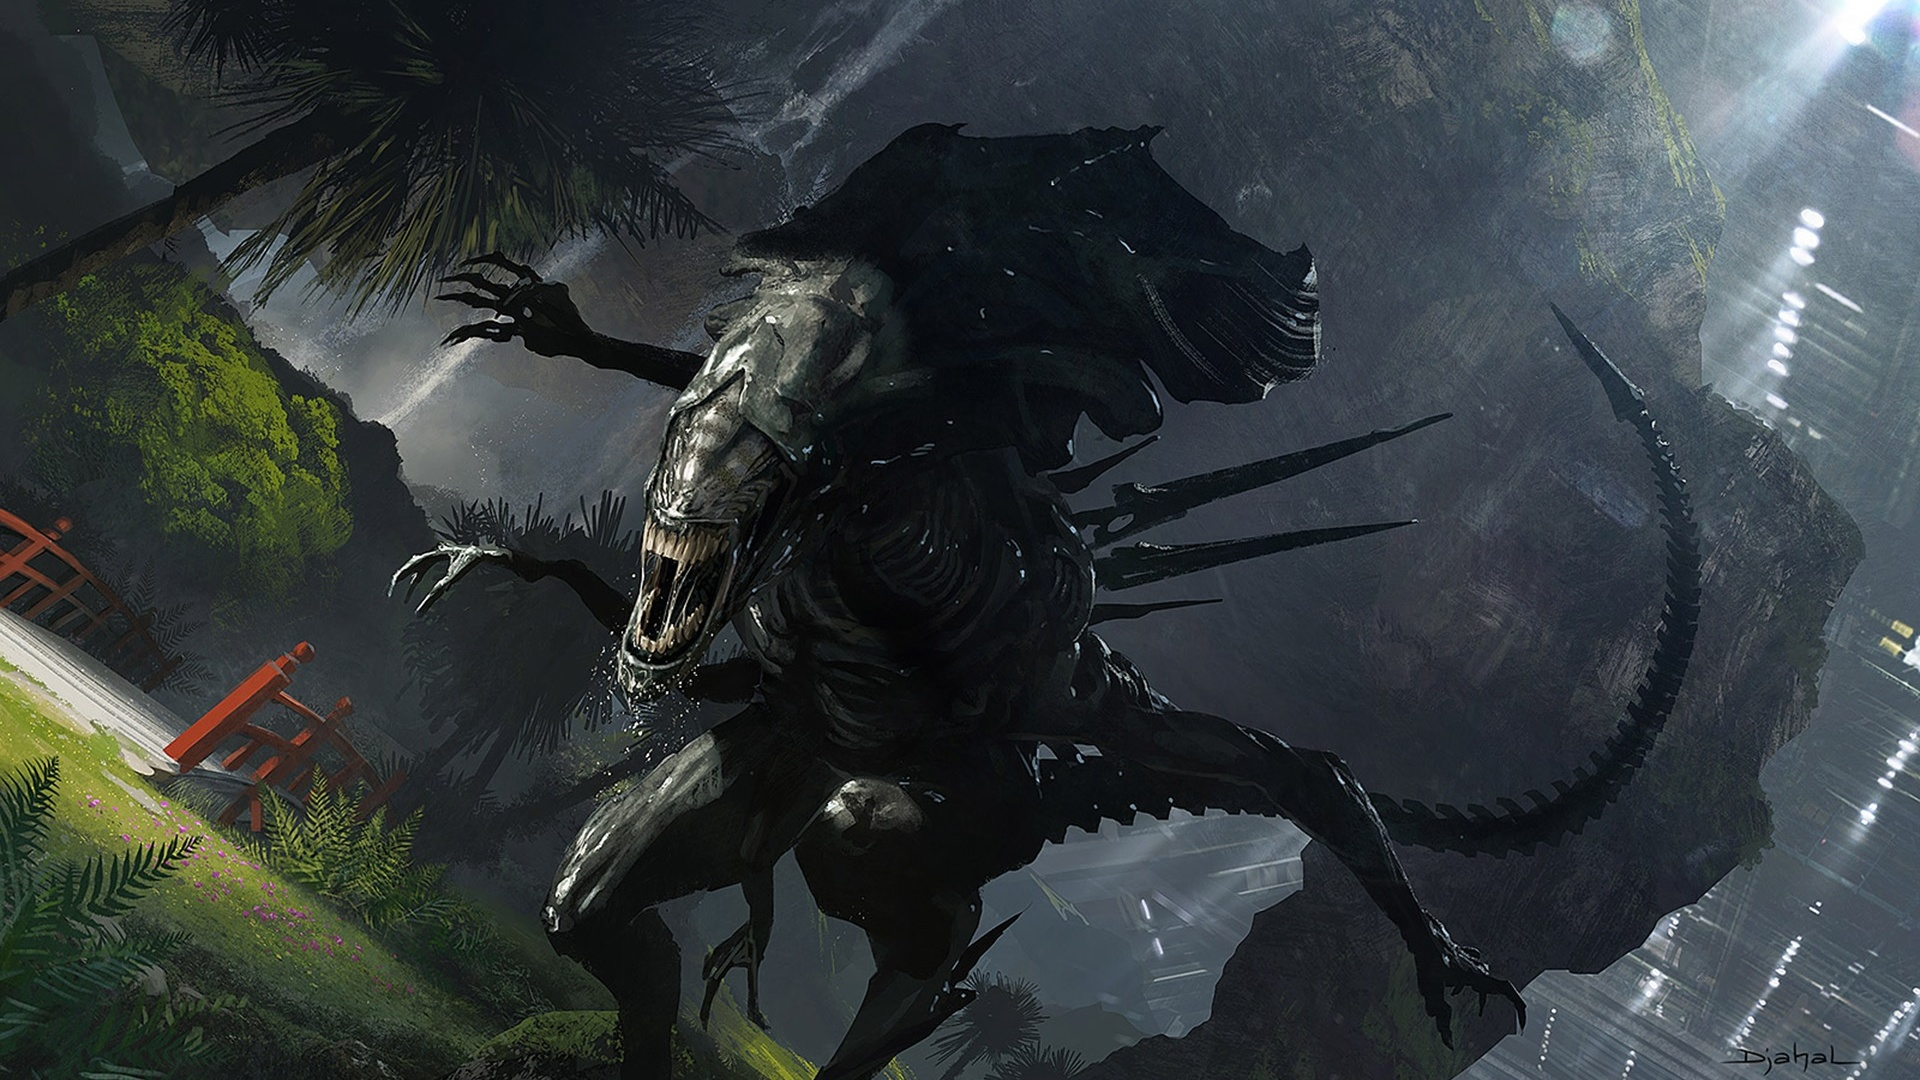 Картинка Чужой чудовище Фэнтези 1920x1080 монстр Монстры Фантастика